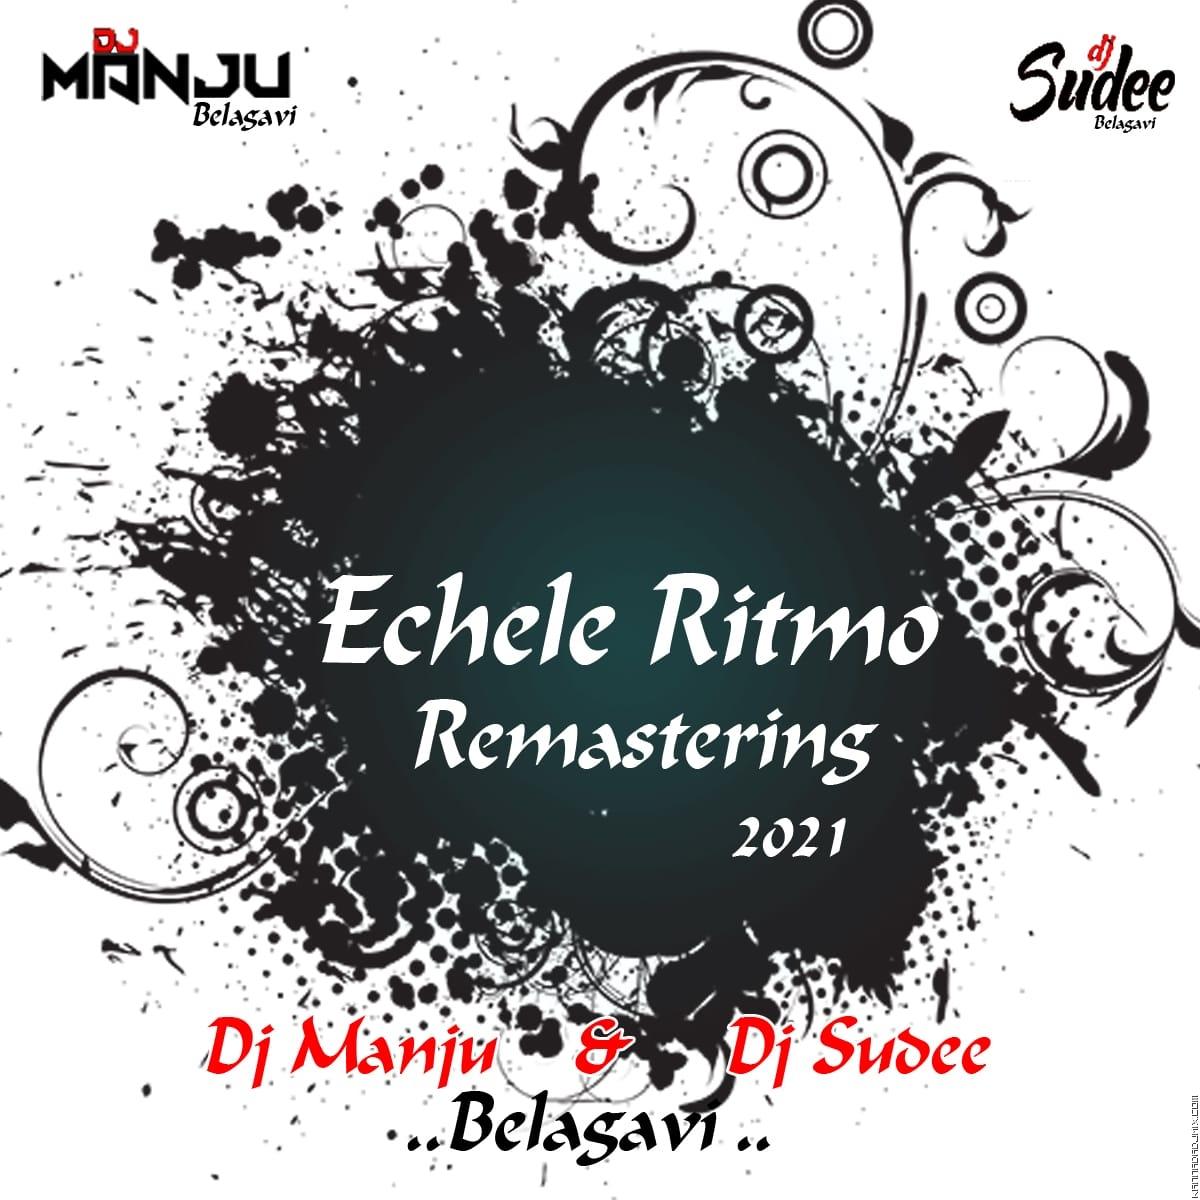 ECHELE RITMO REMASTERING DJ MANJU BELAGAVI & DJ SUDEE BELAGAVI 2021.mp3